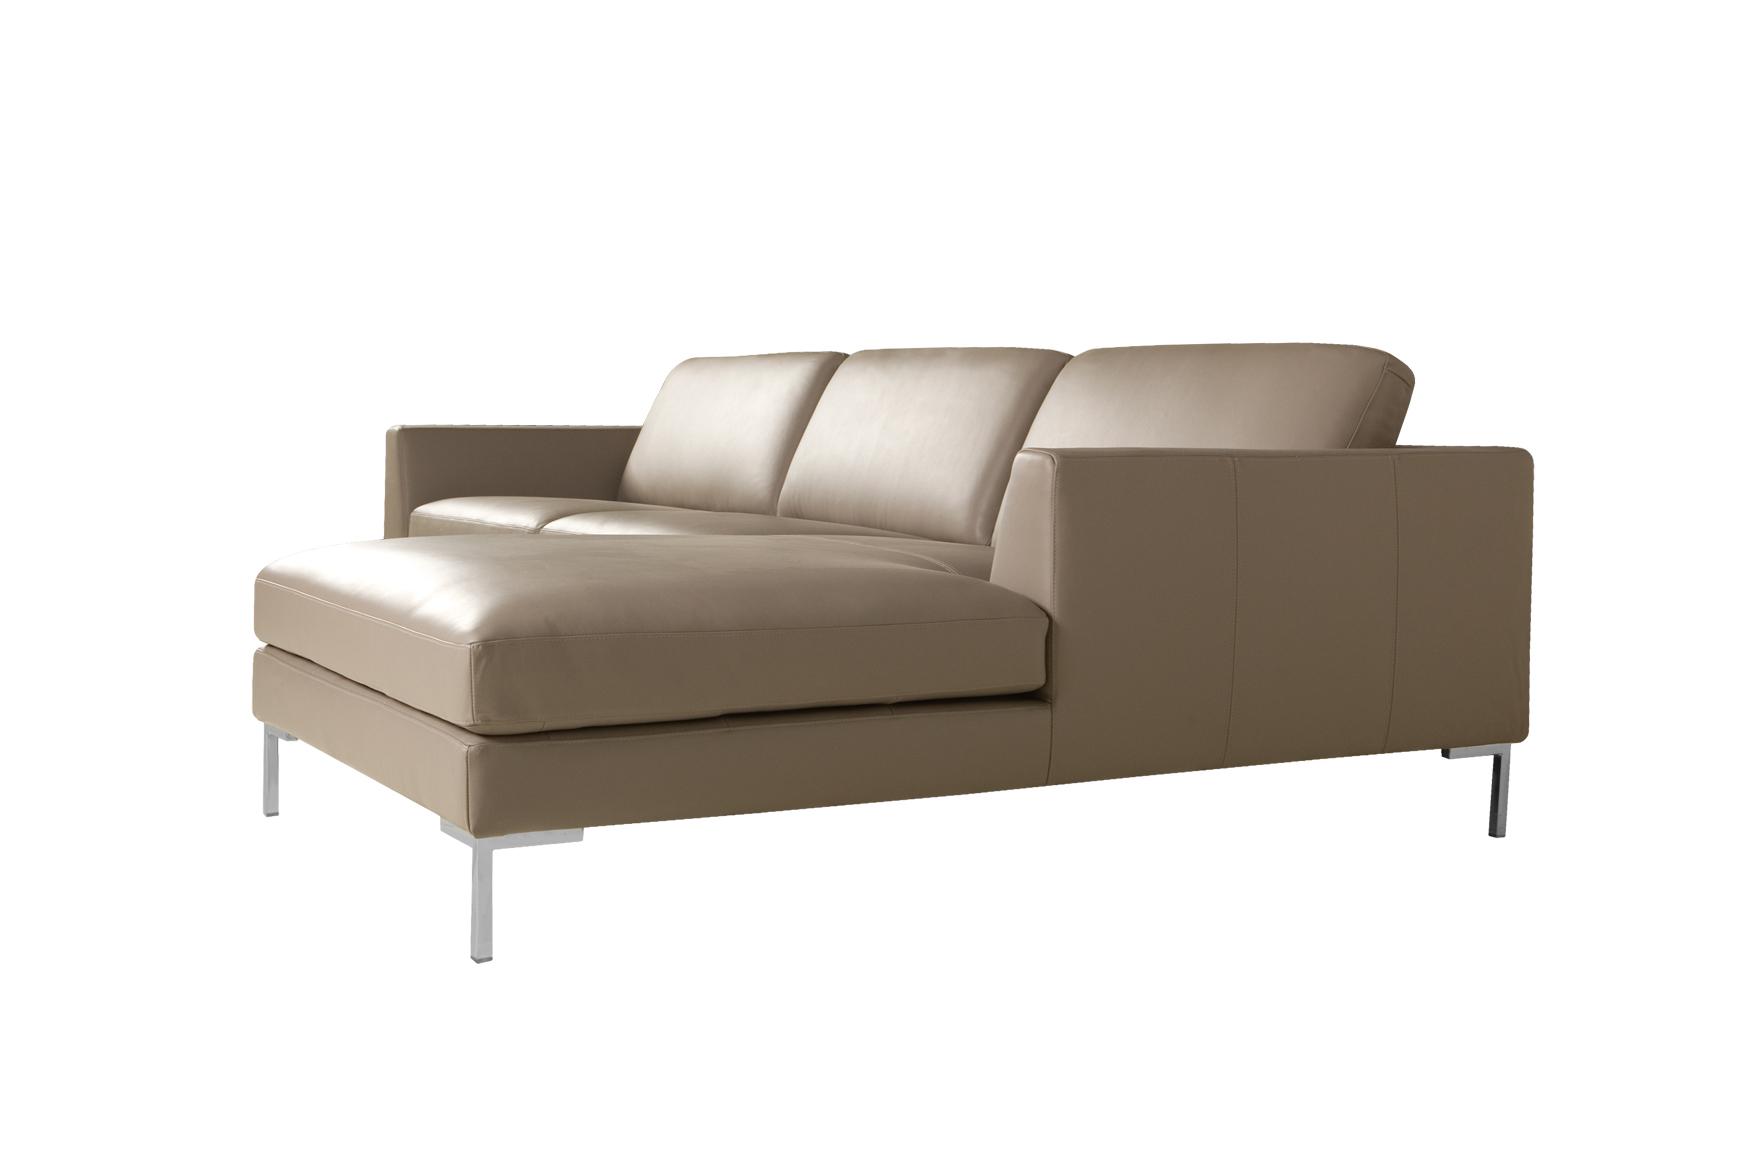 Allegra Set 1 Sofa With Chaiselongue-33206